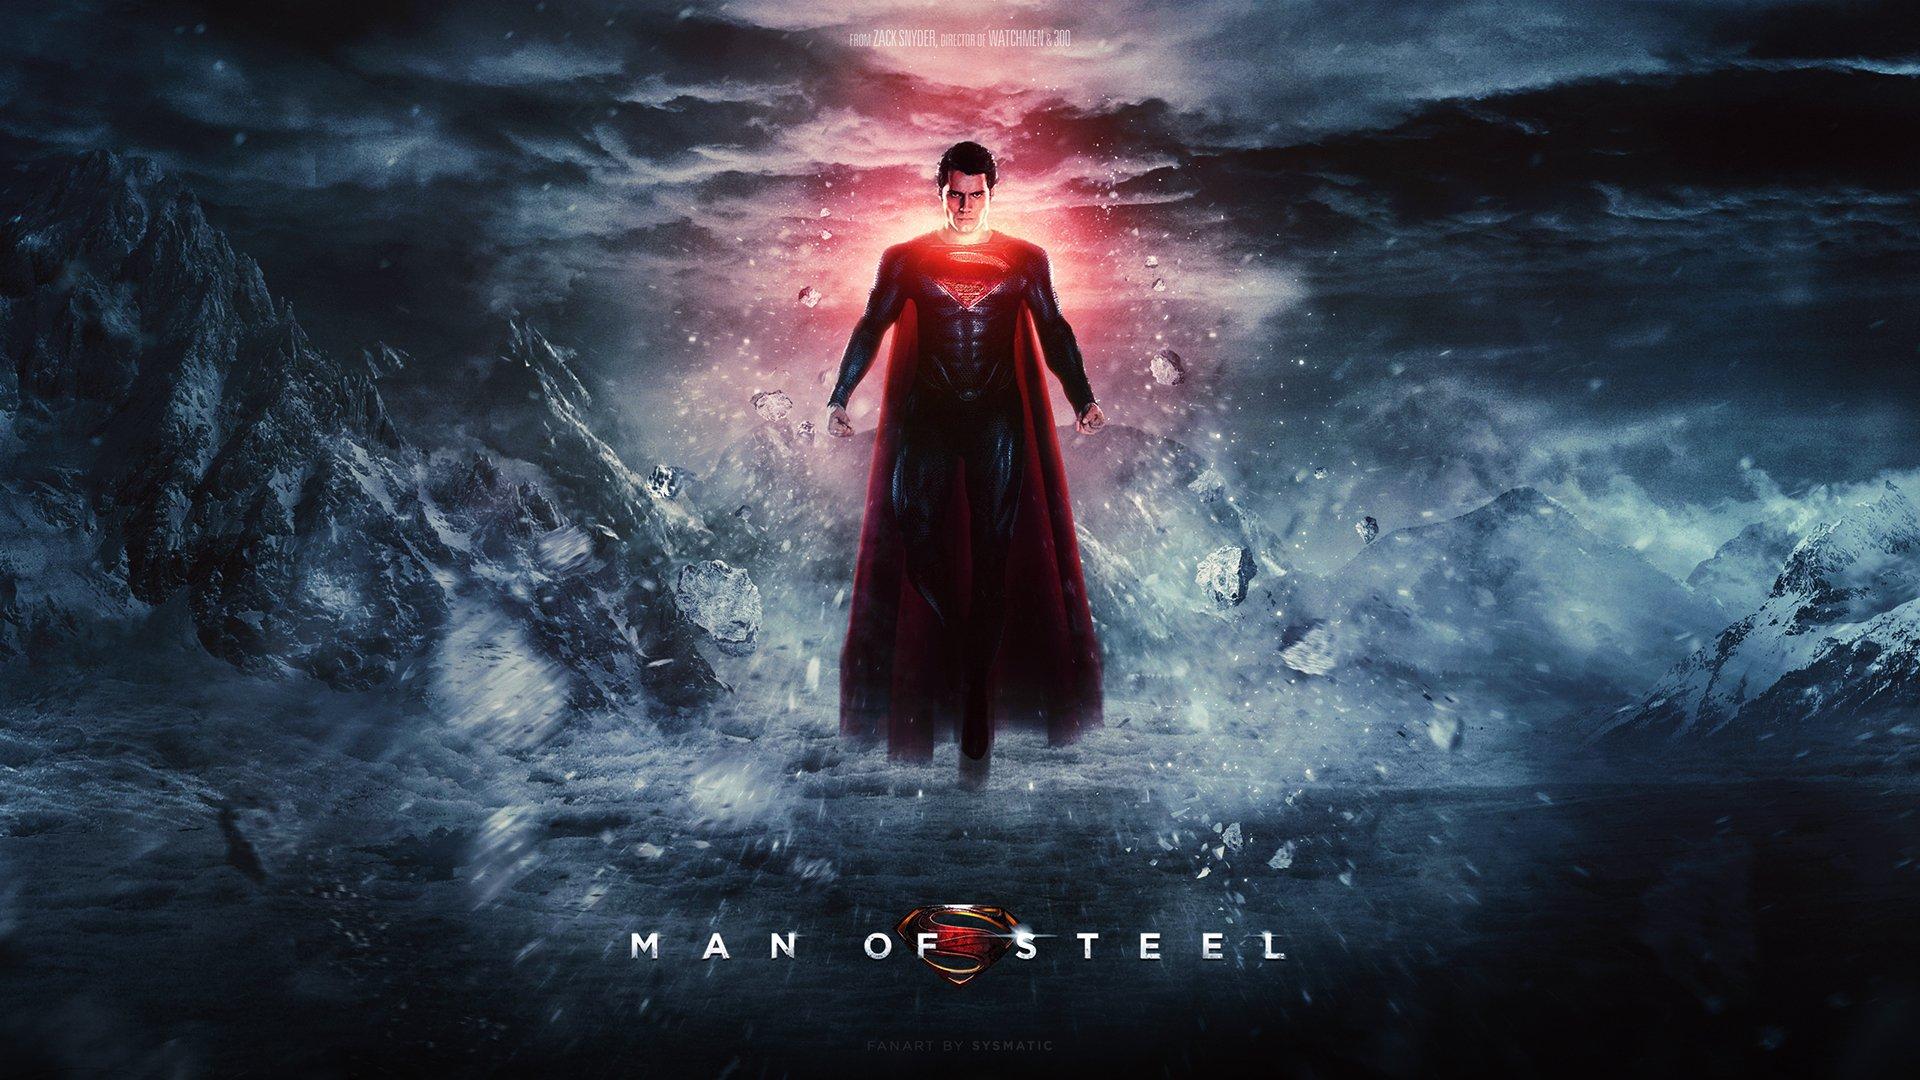 man of steel wallpaper superman movie 02 1920x1080